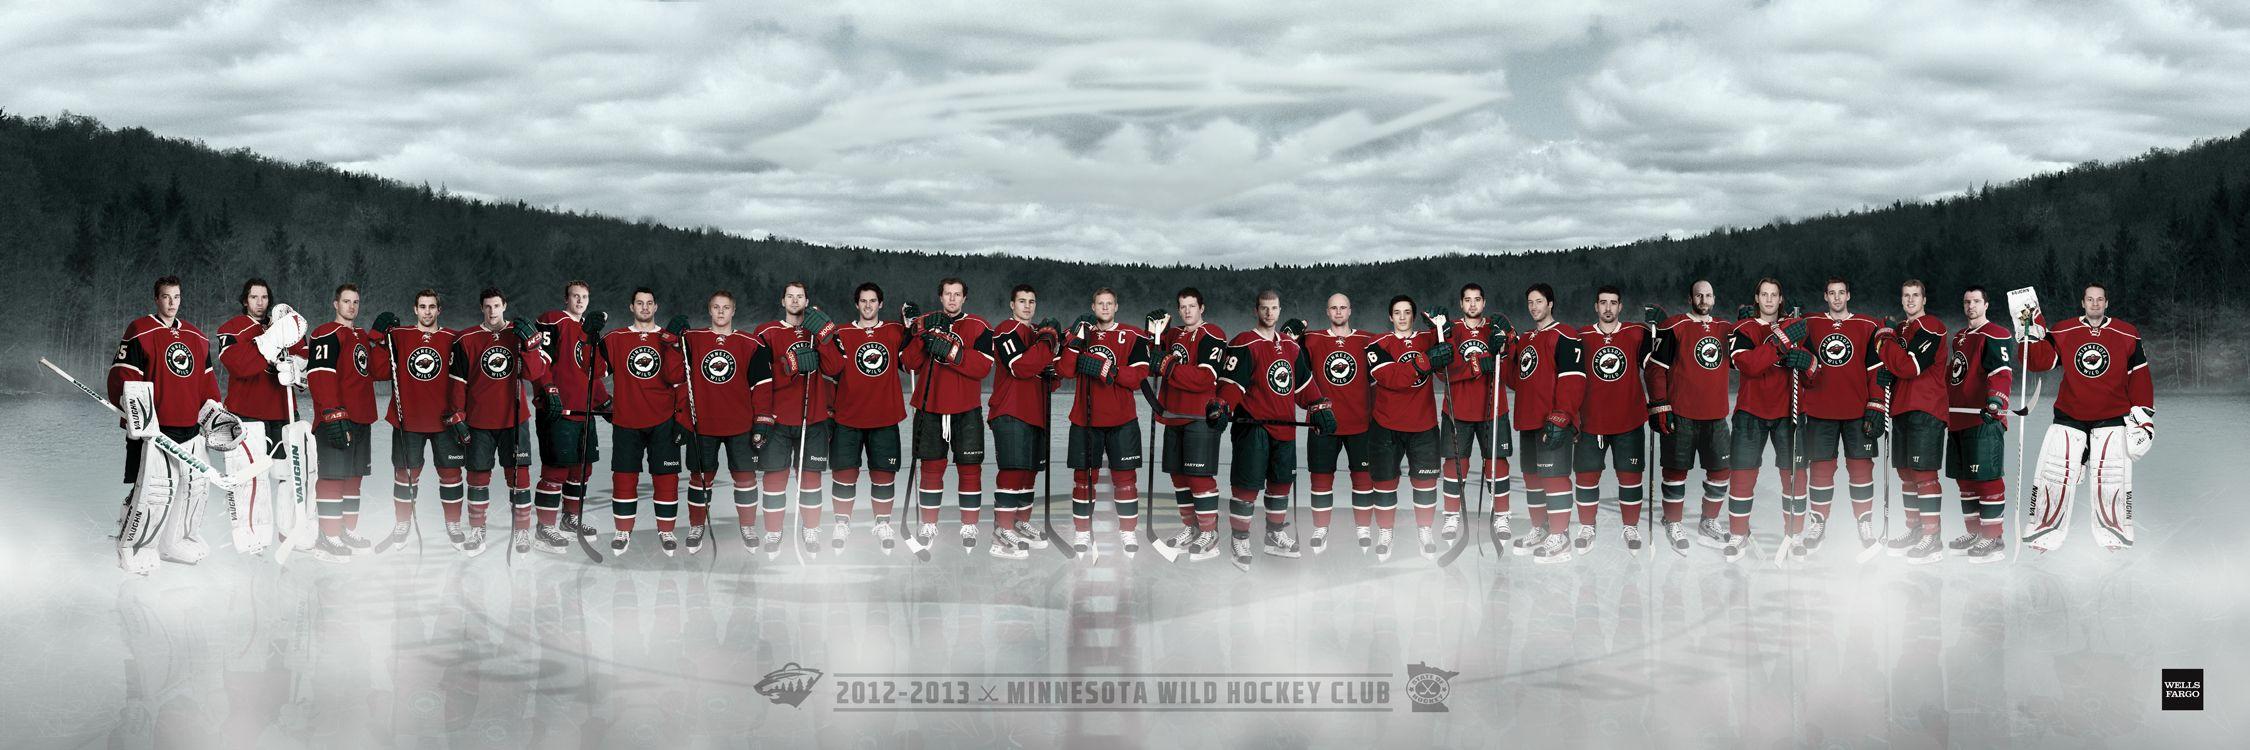 minnesota wild hockey minnesota wild